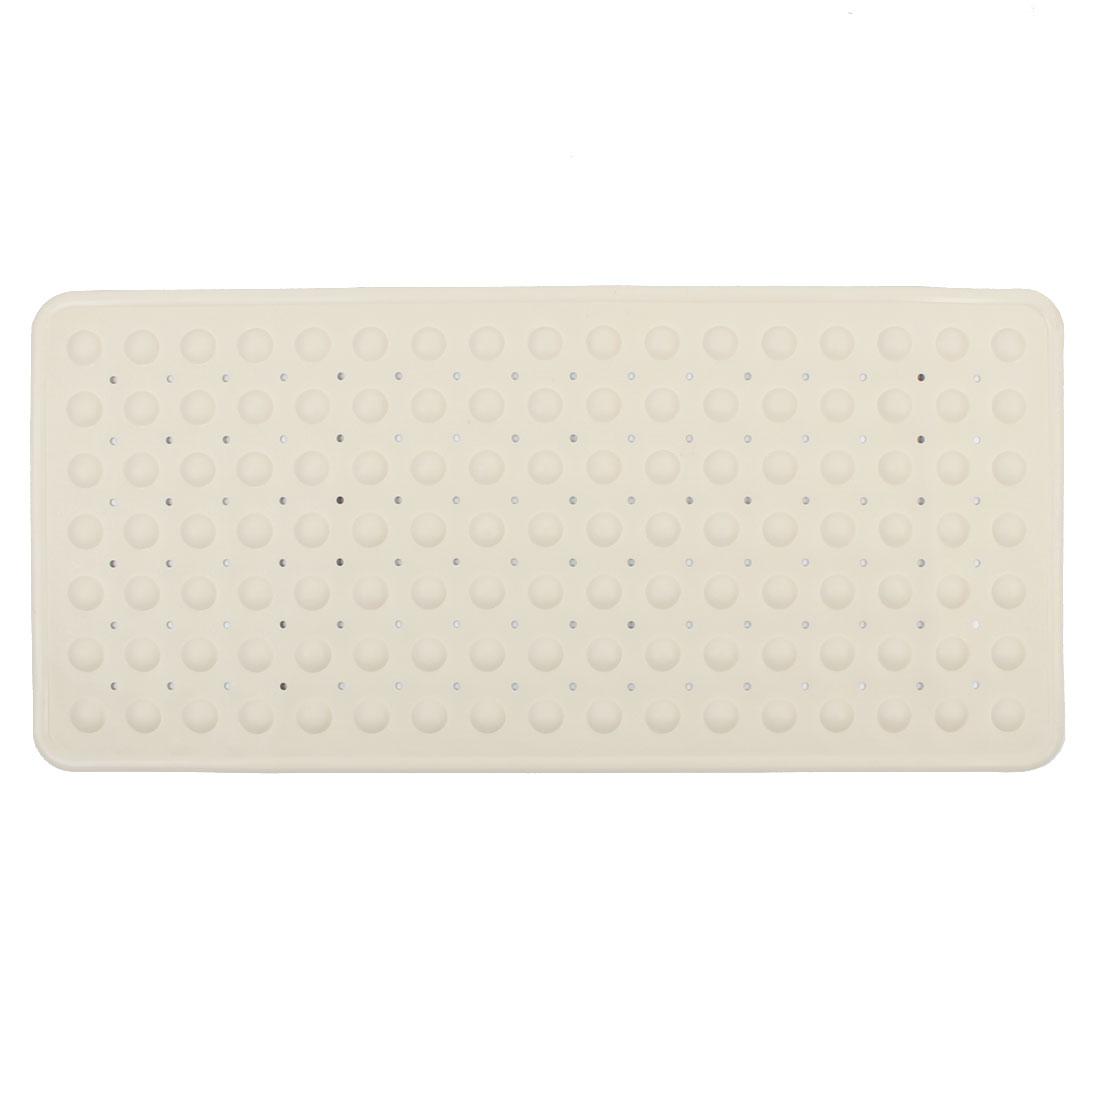 Hotel Bathroom Rubber Slip-Resistant Suction Floor Bath Mat Beige 35cm x 75cm